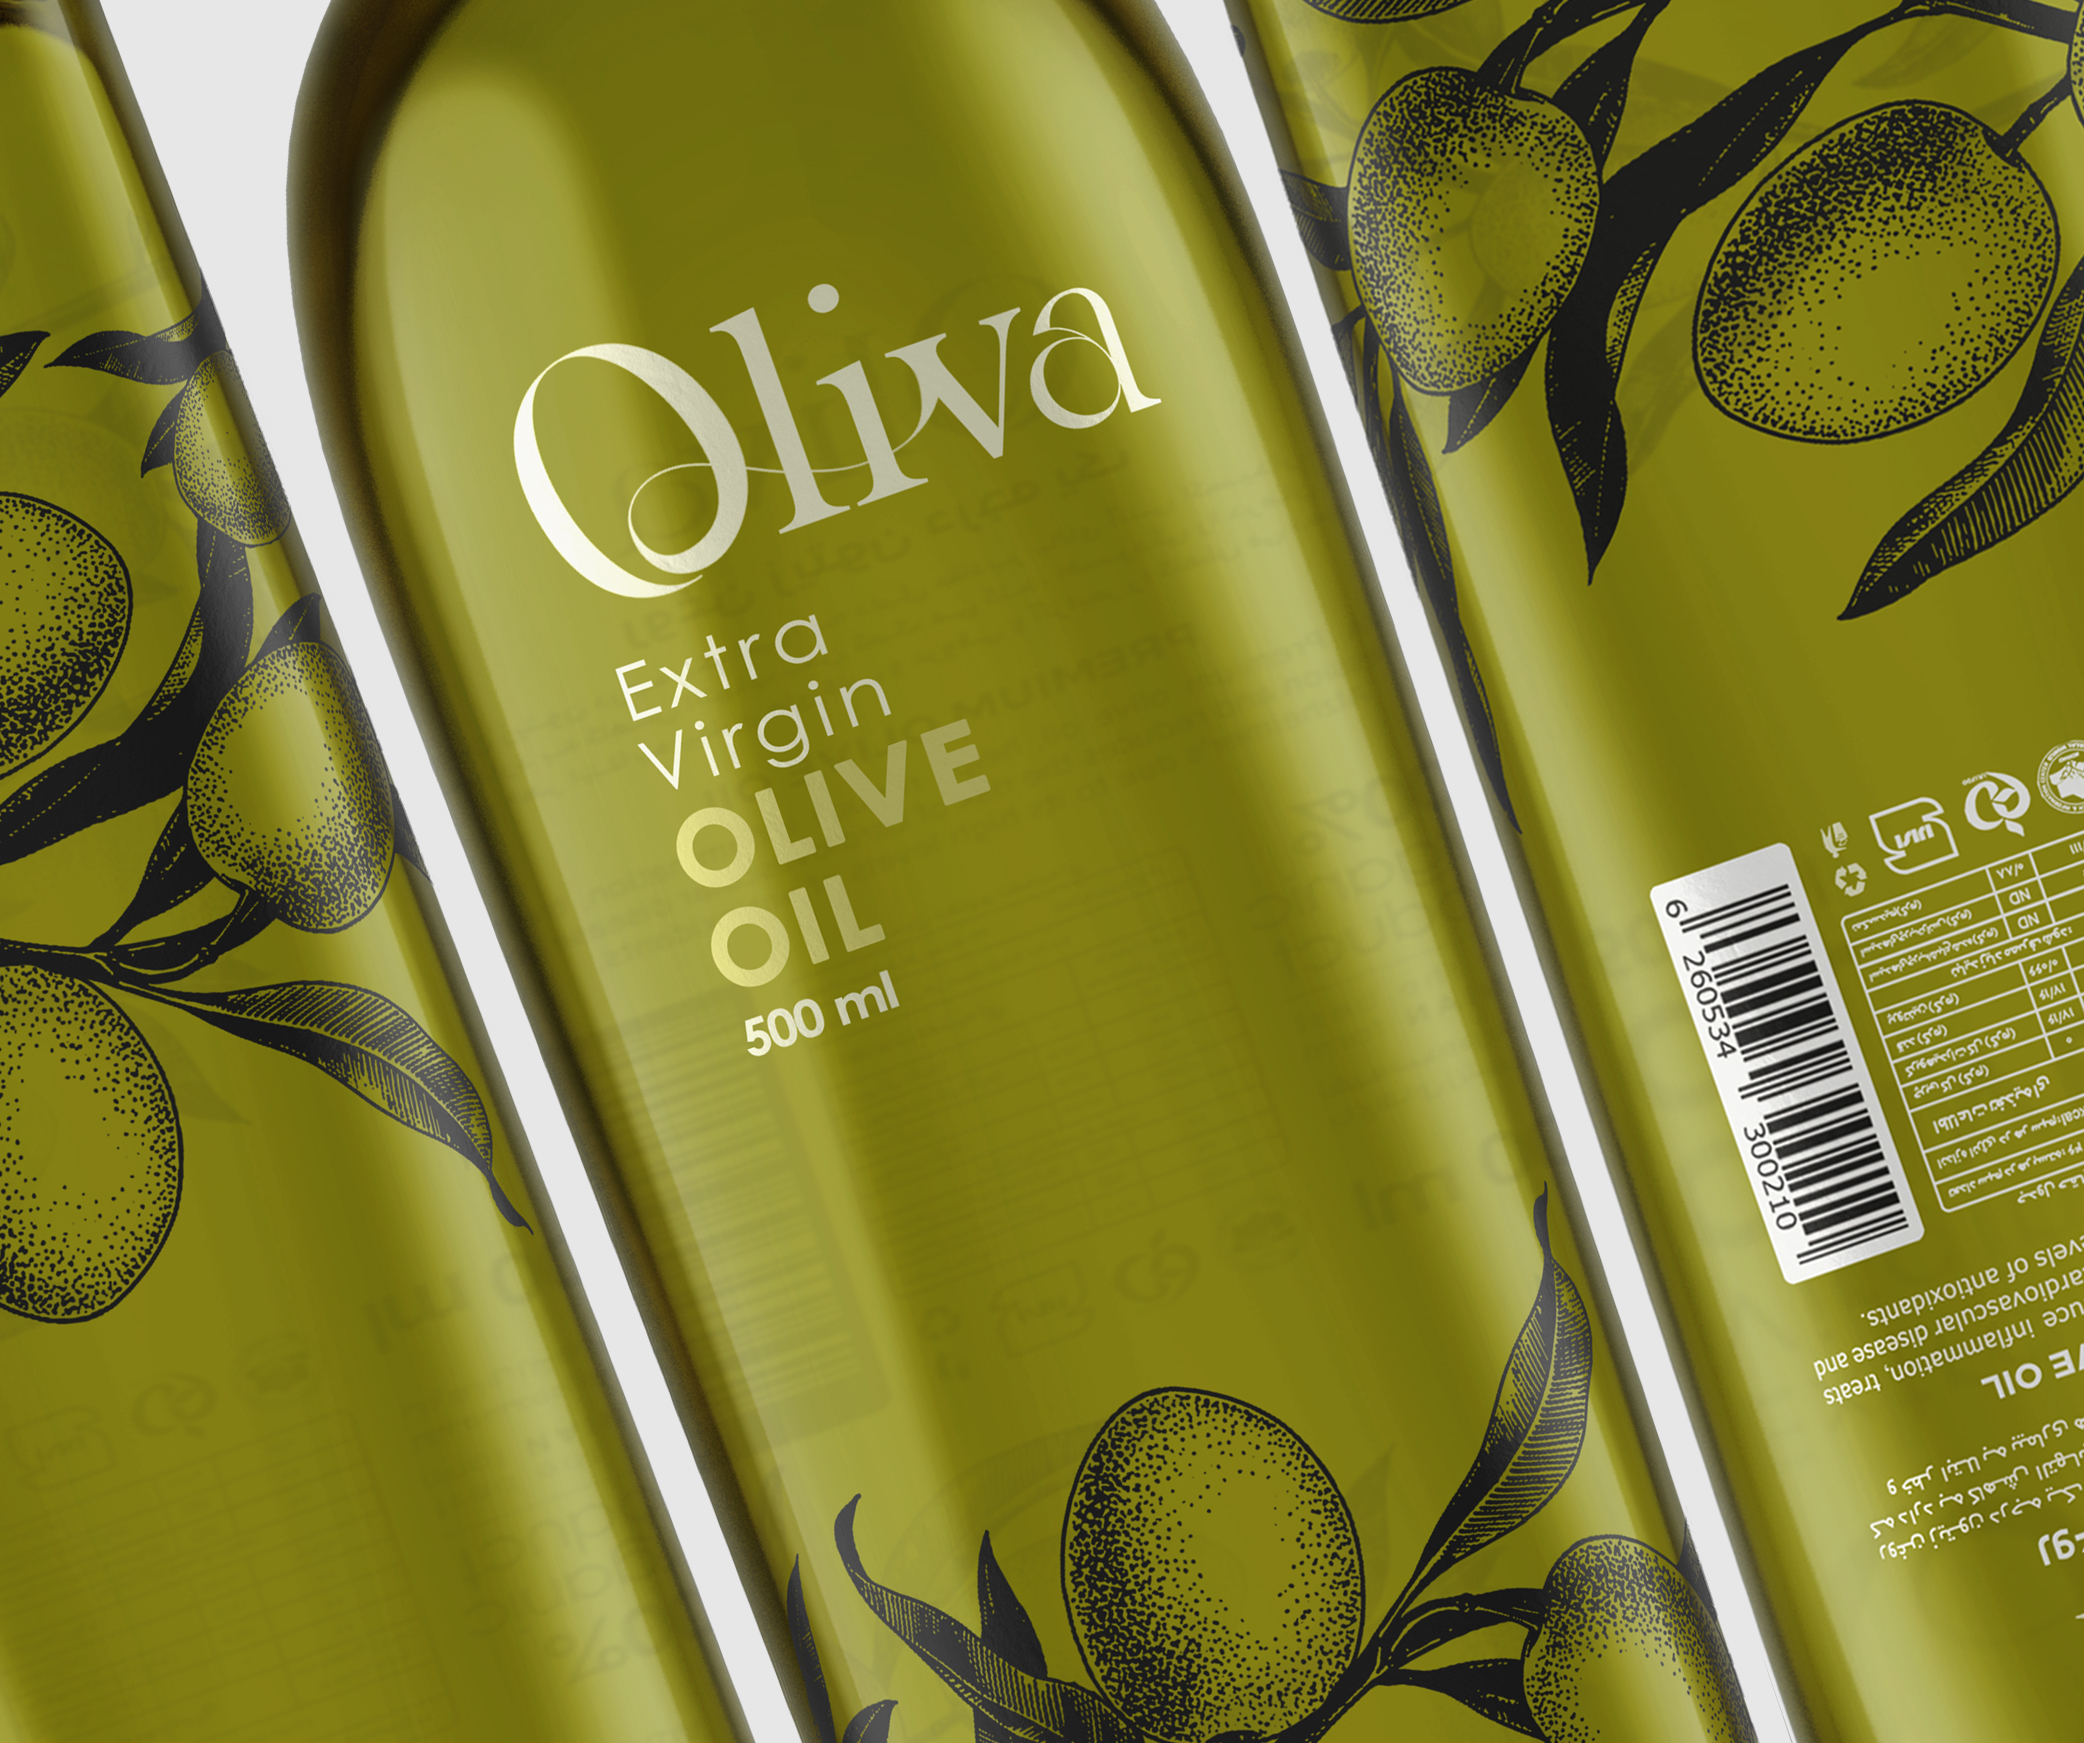 Studio Metis Olivia Olive Oil